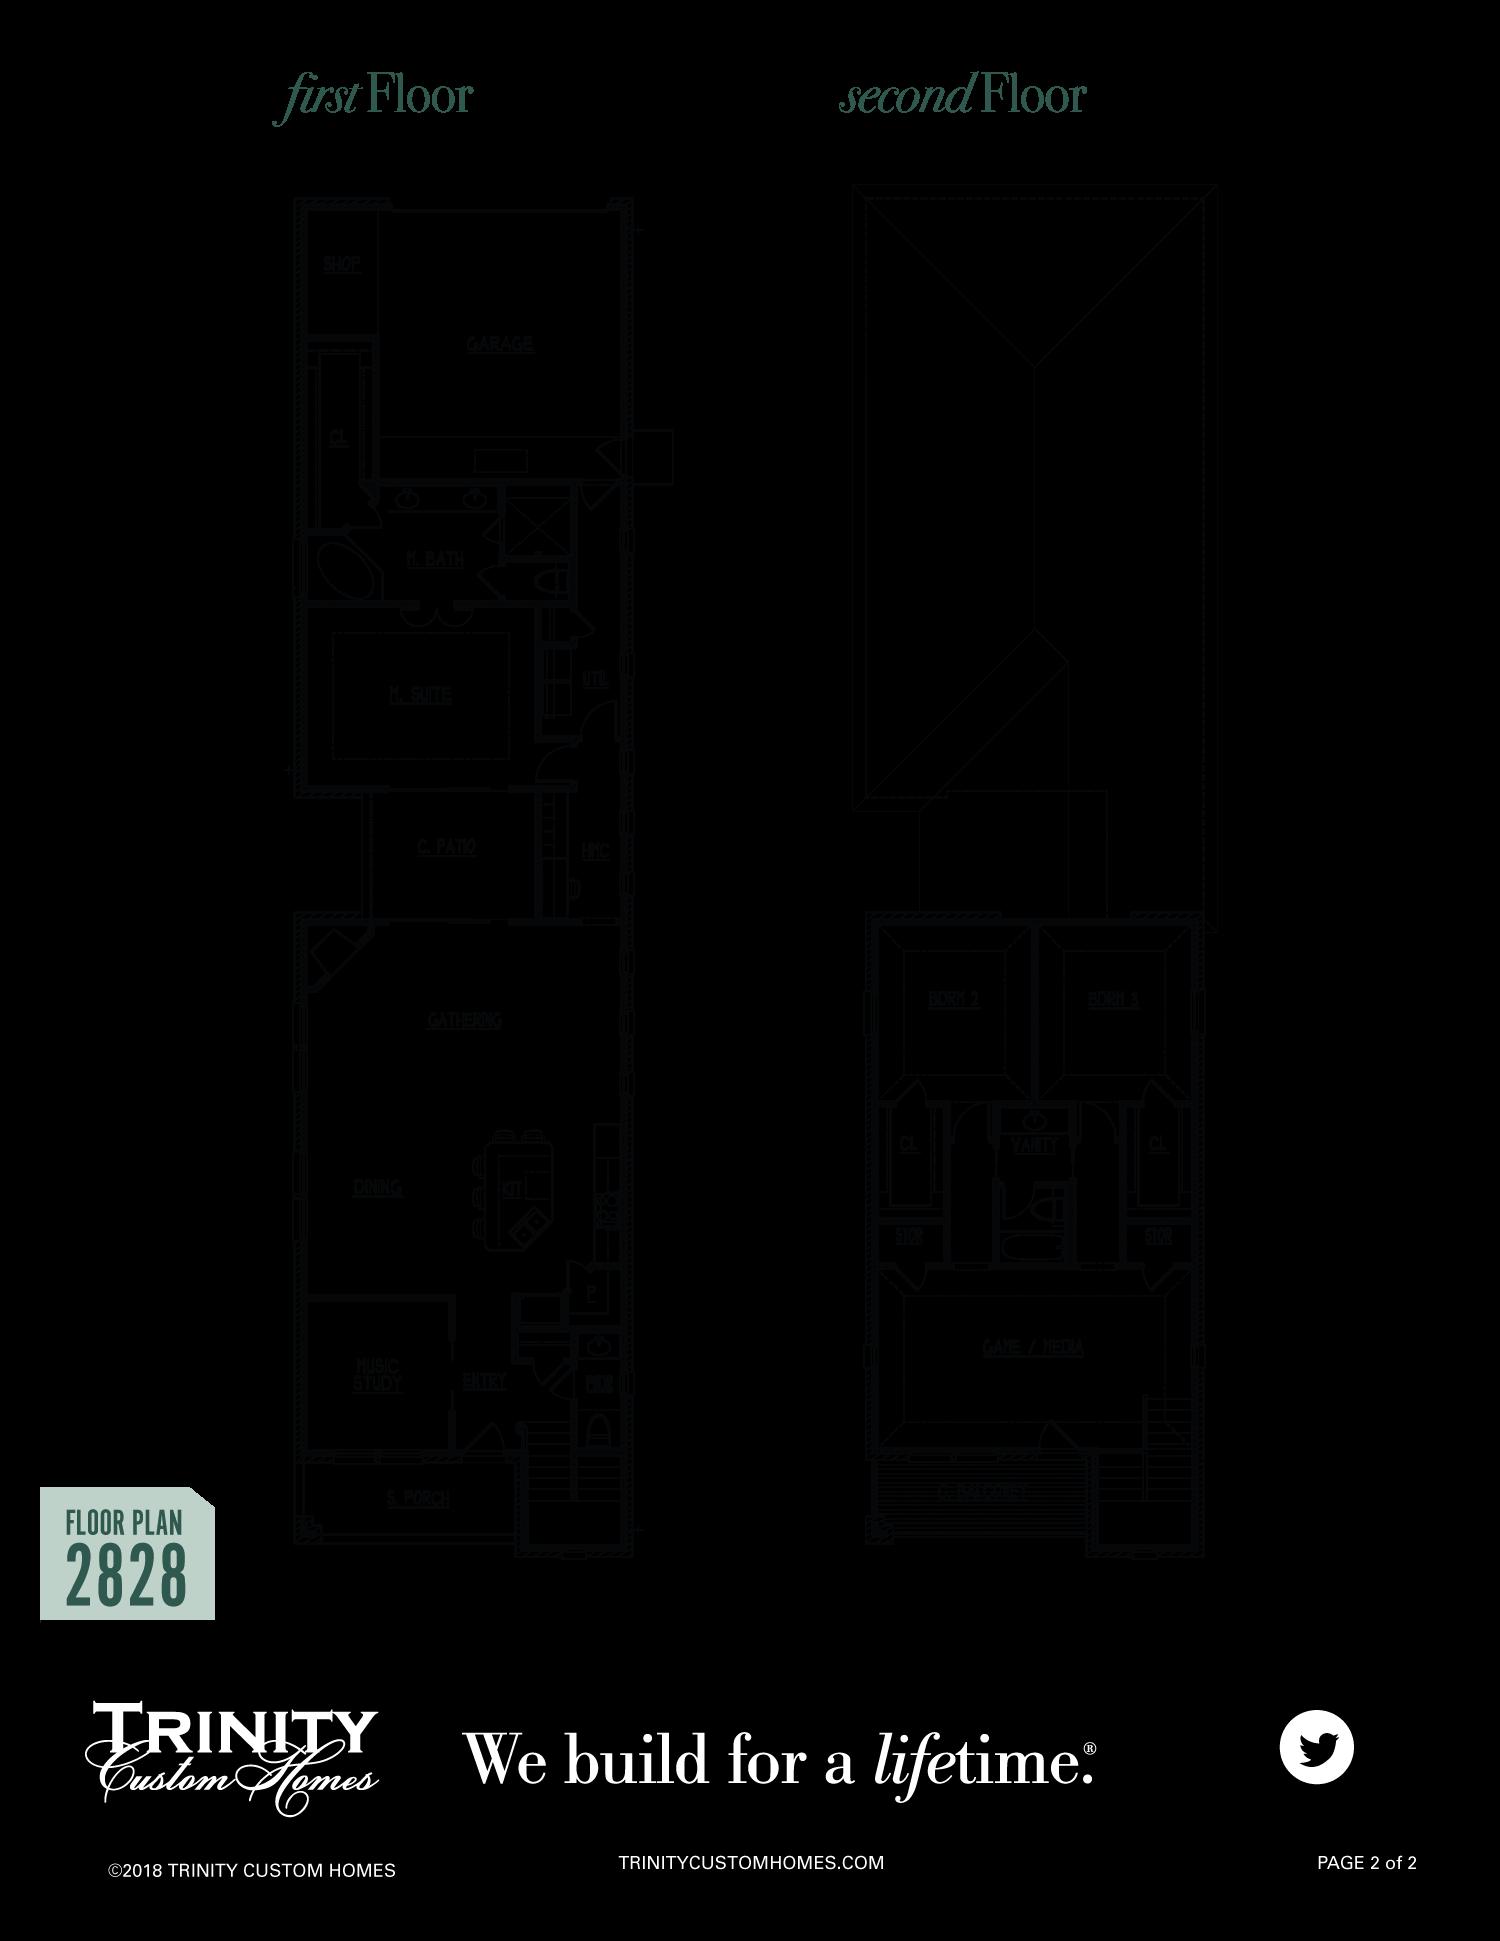 FloorPlan2828